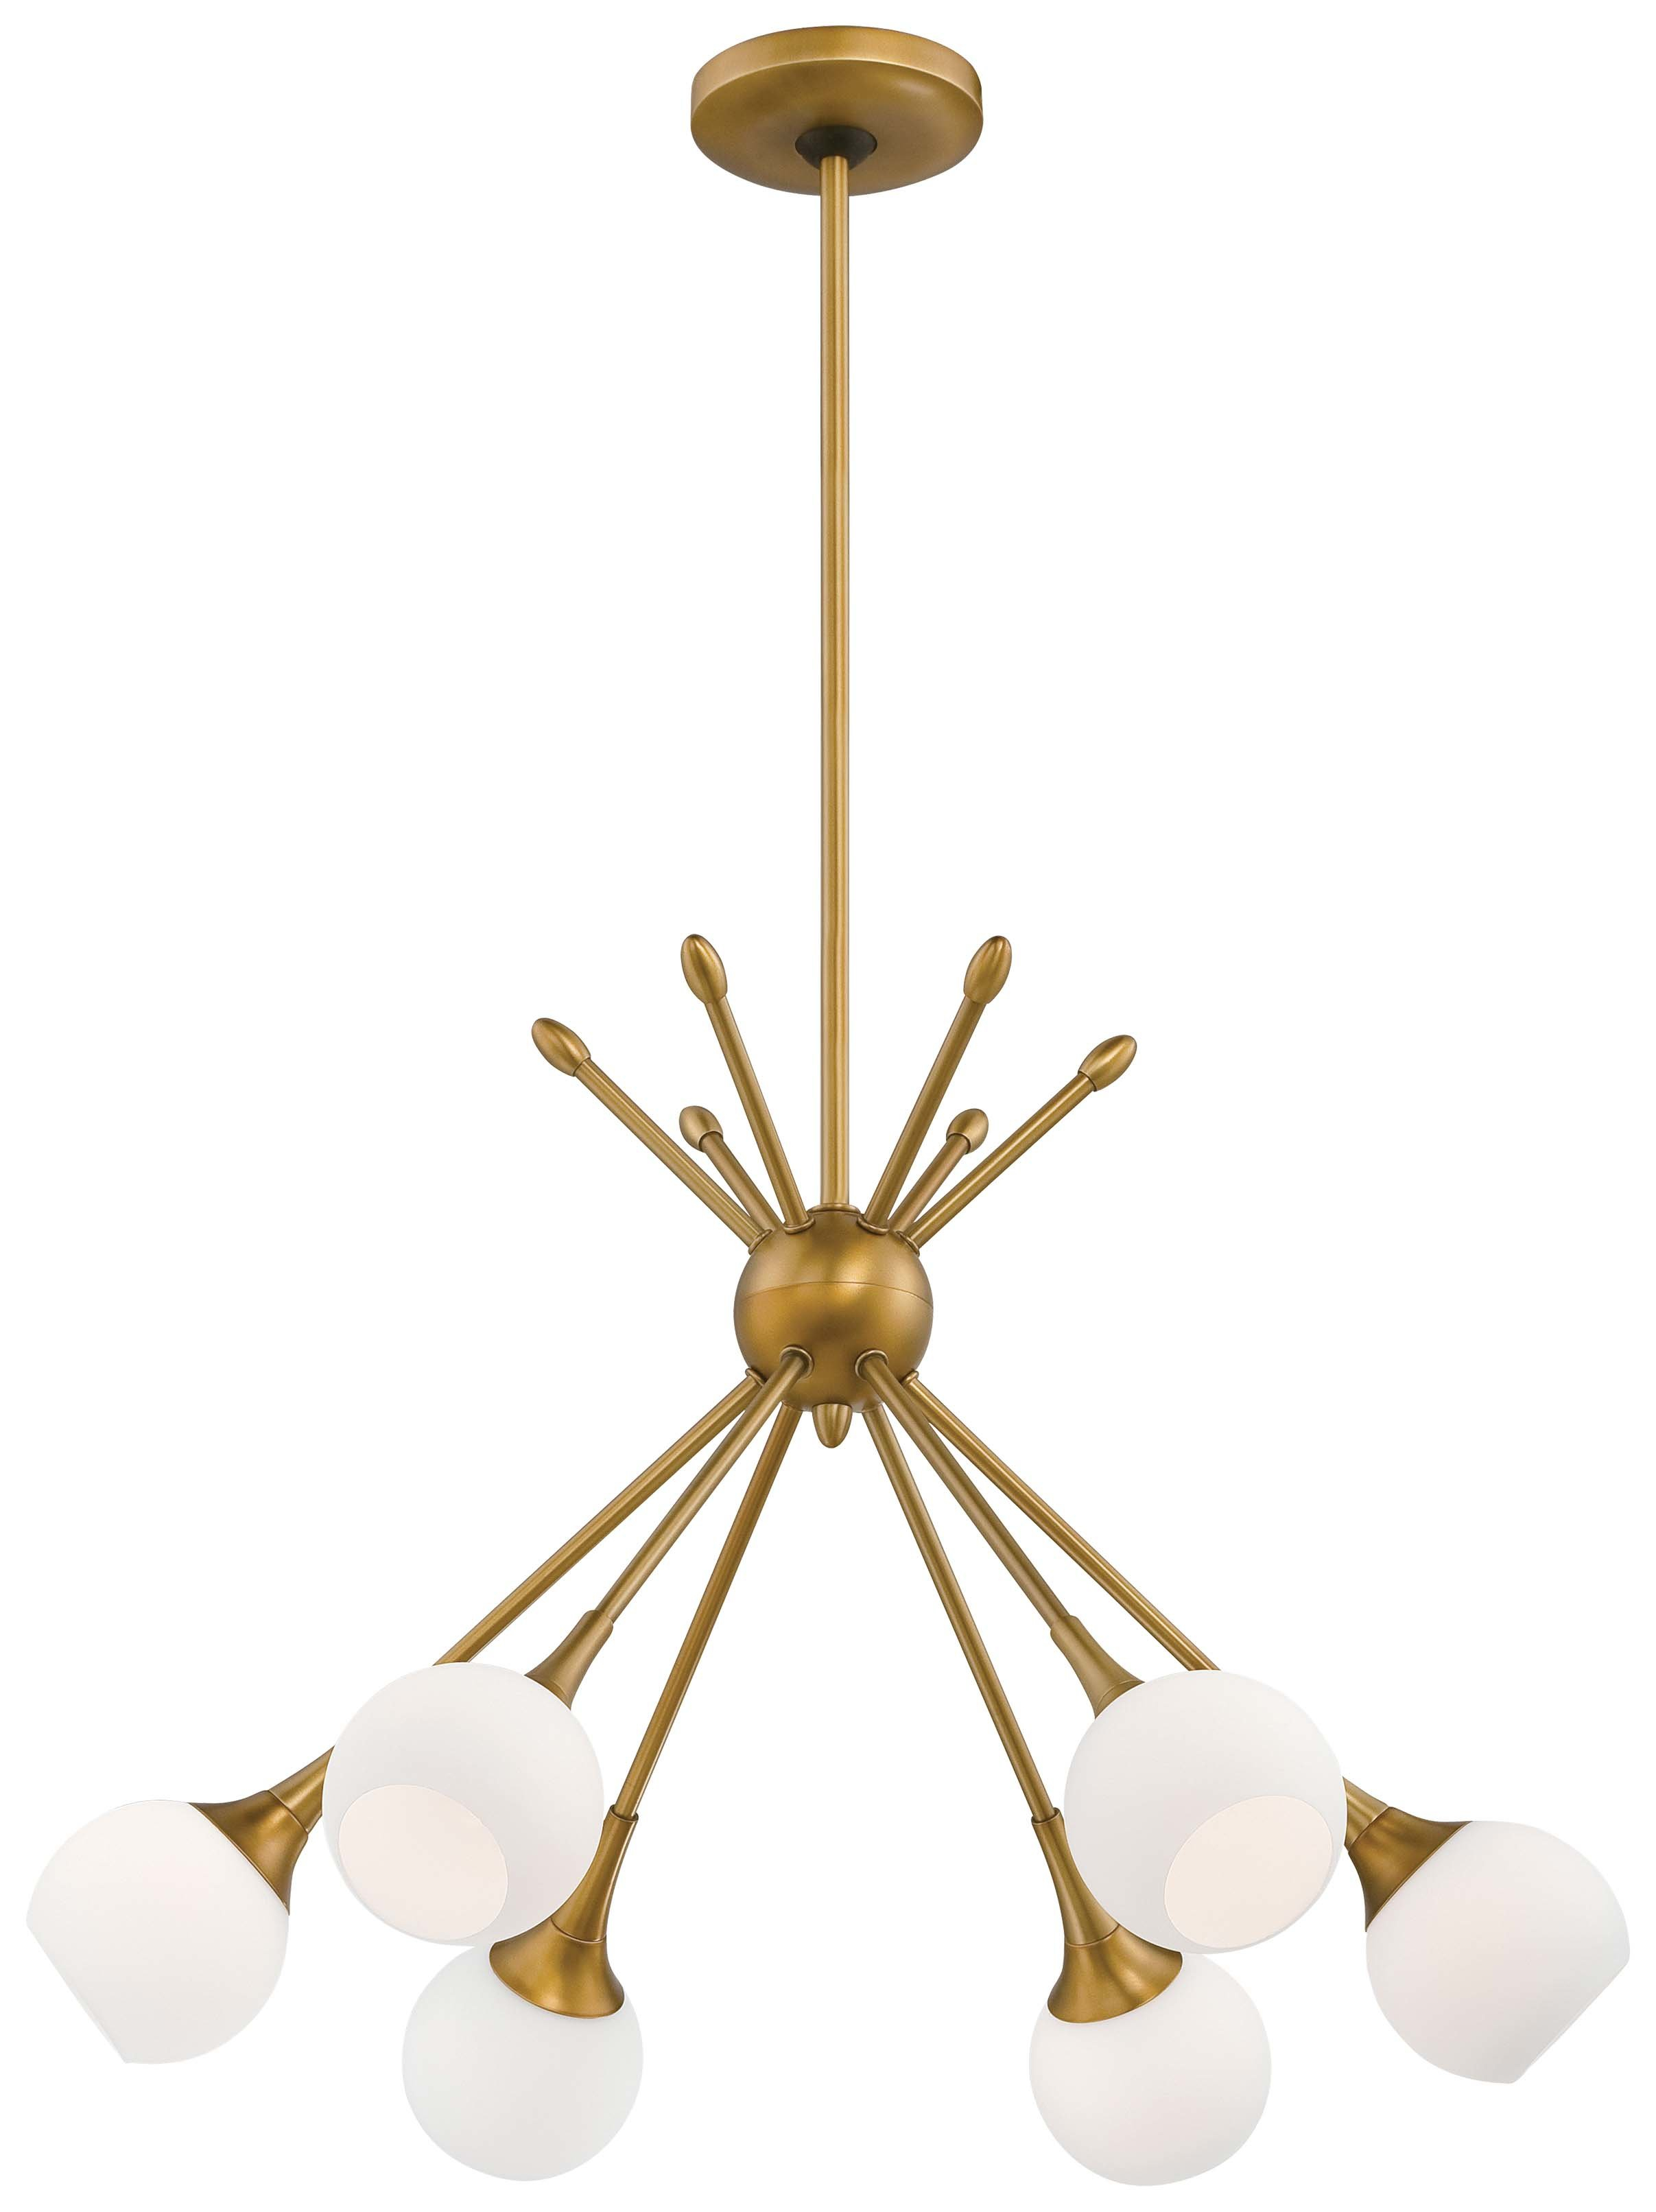 Silvia 6 Light Sputnik Chandelier Pertaining To Bautista 6 Light Sputnik Chandeliers (View 9 of 30)